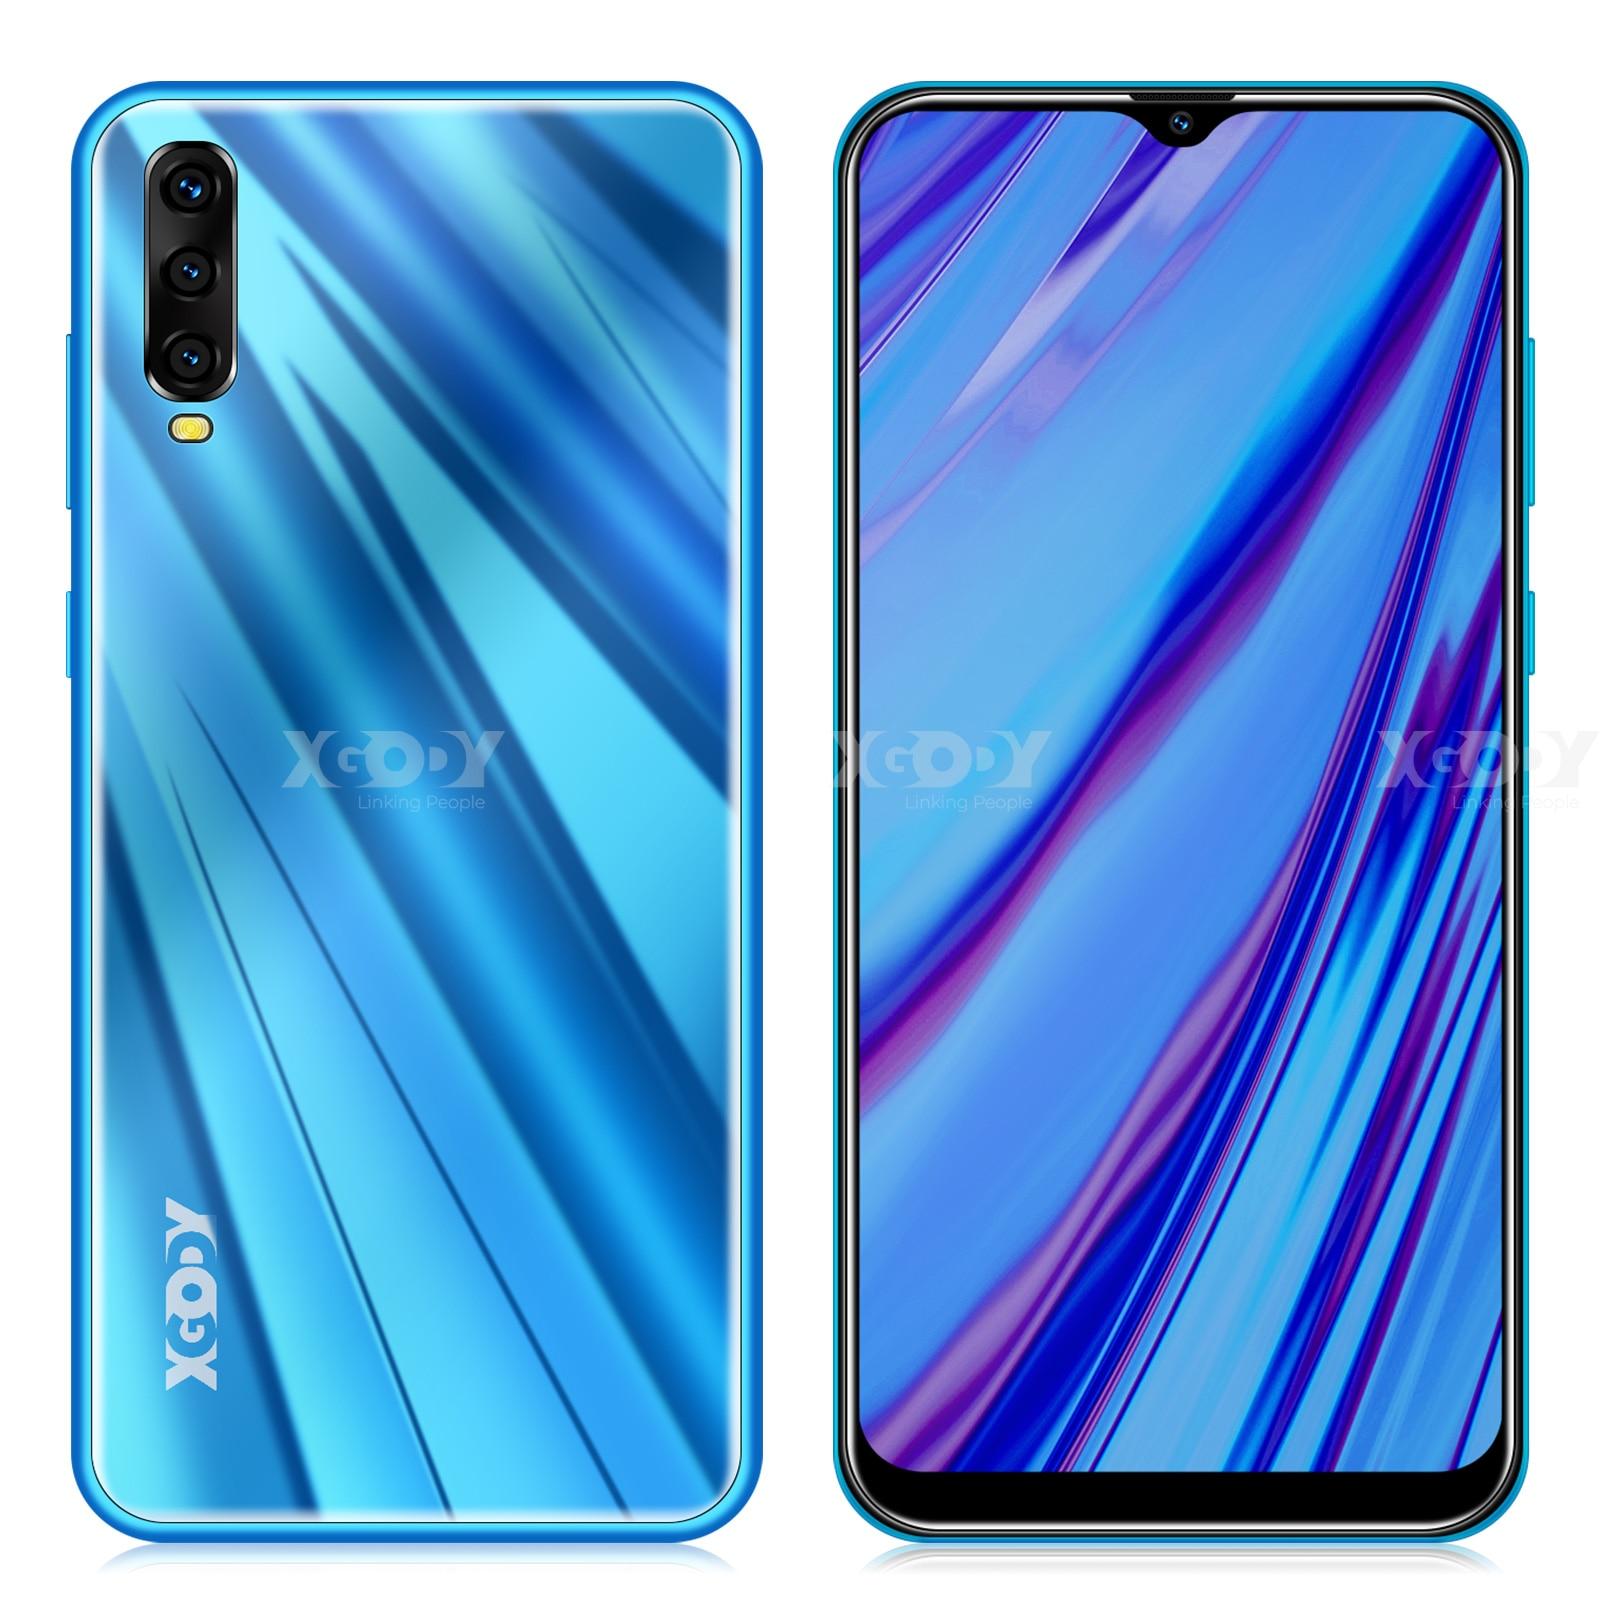 "XGODY A90 3G Smartphone 6.53"" 19:9 Android 9.0 2GB RAM 16GB ROM MT6580 Quad Core Dual Sim GPS WiFi Mobile Phone CellPhone"